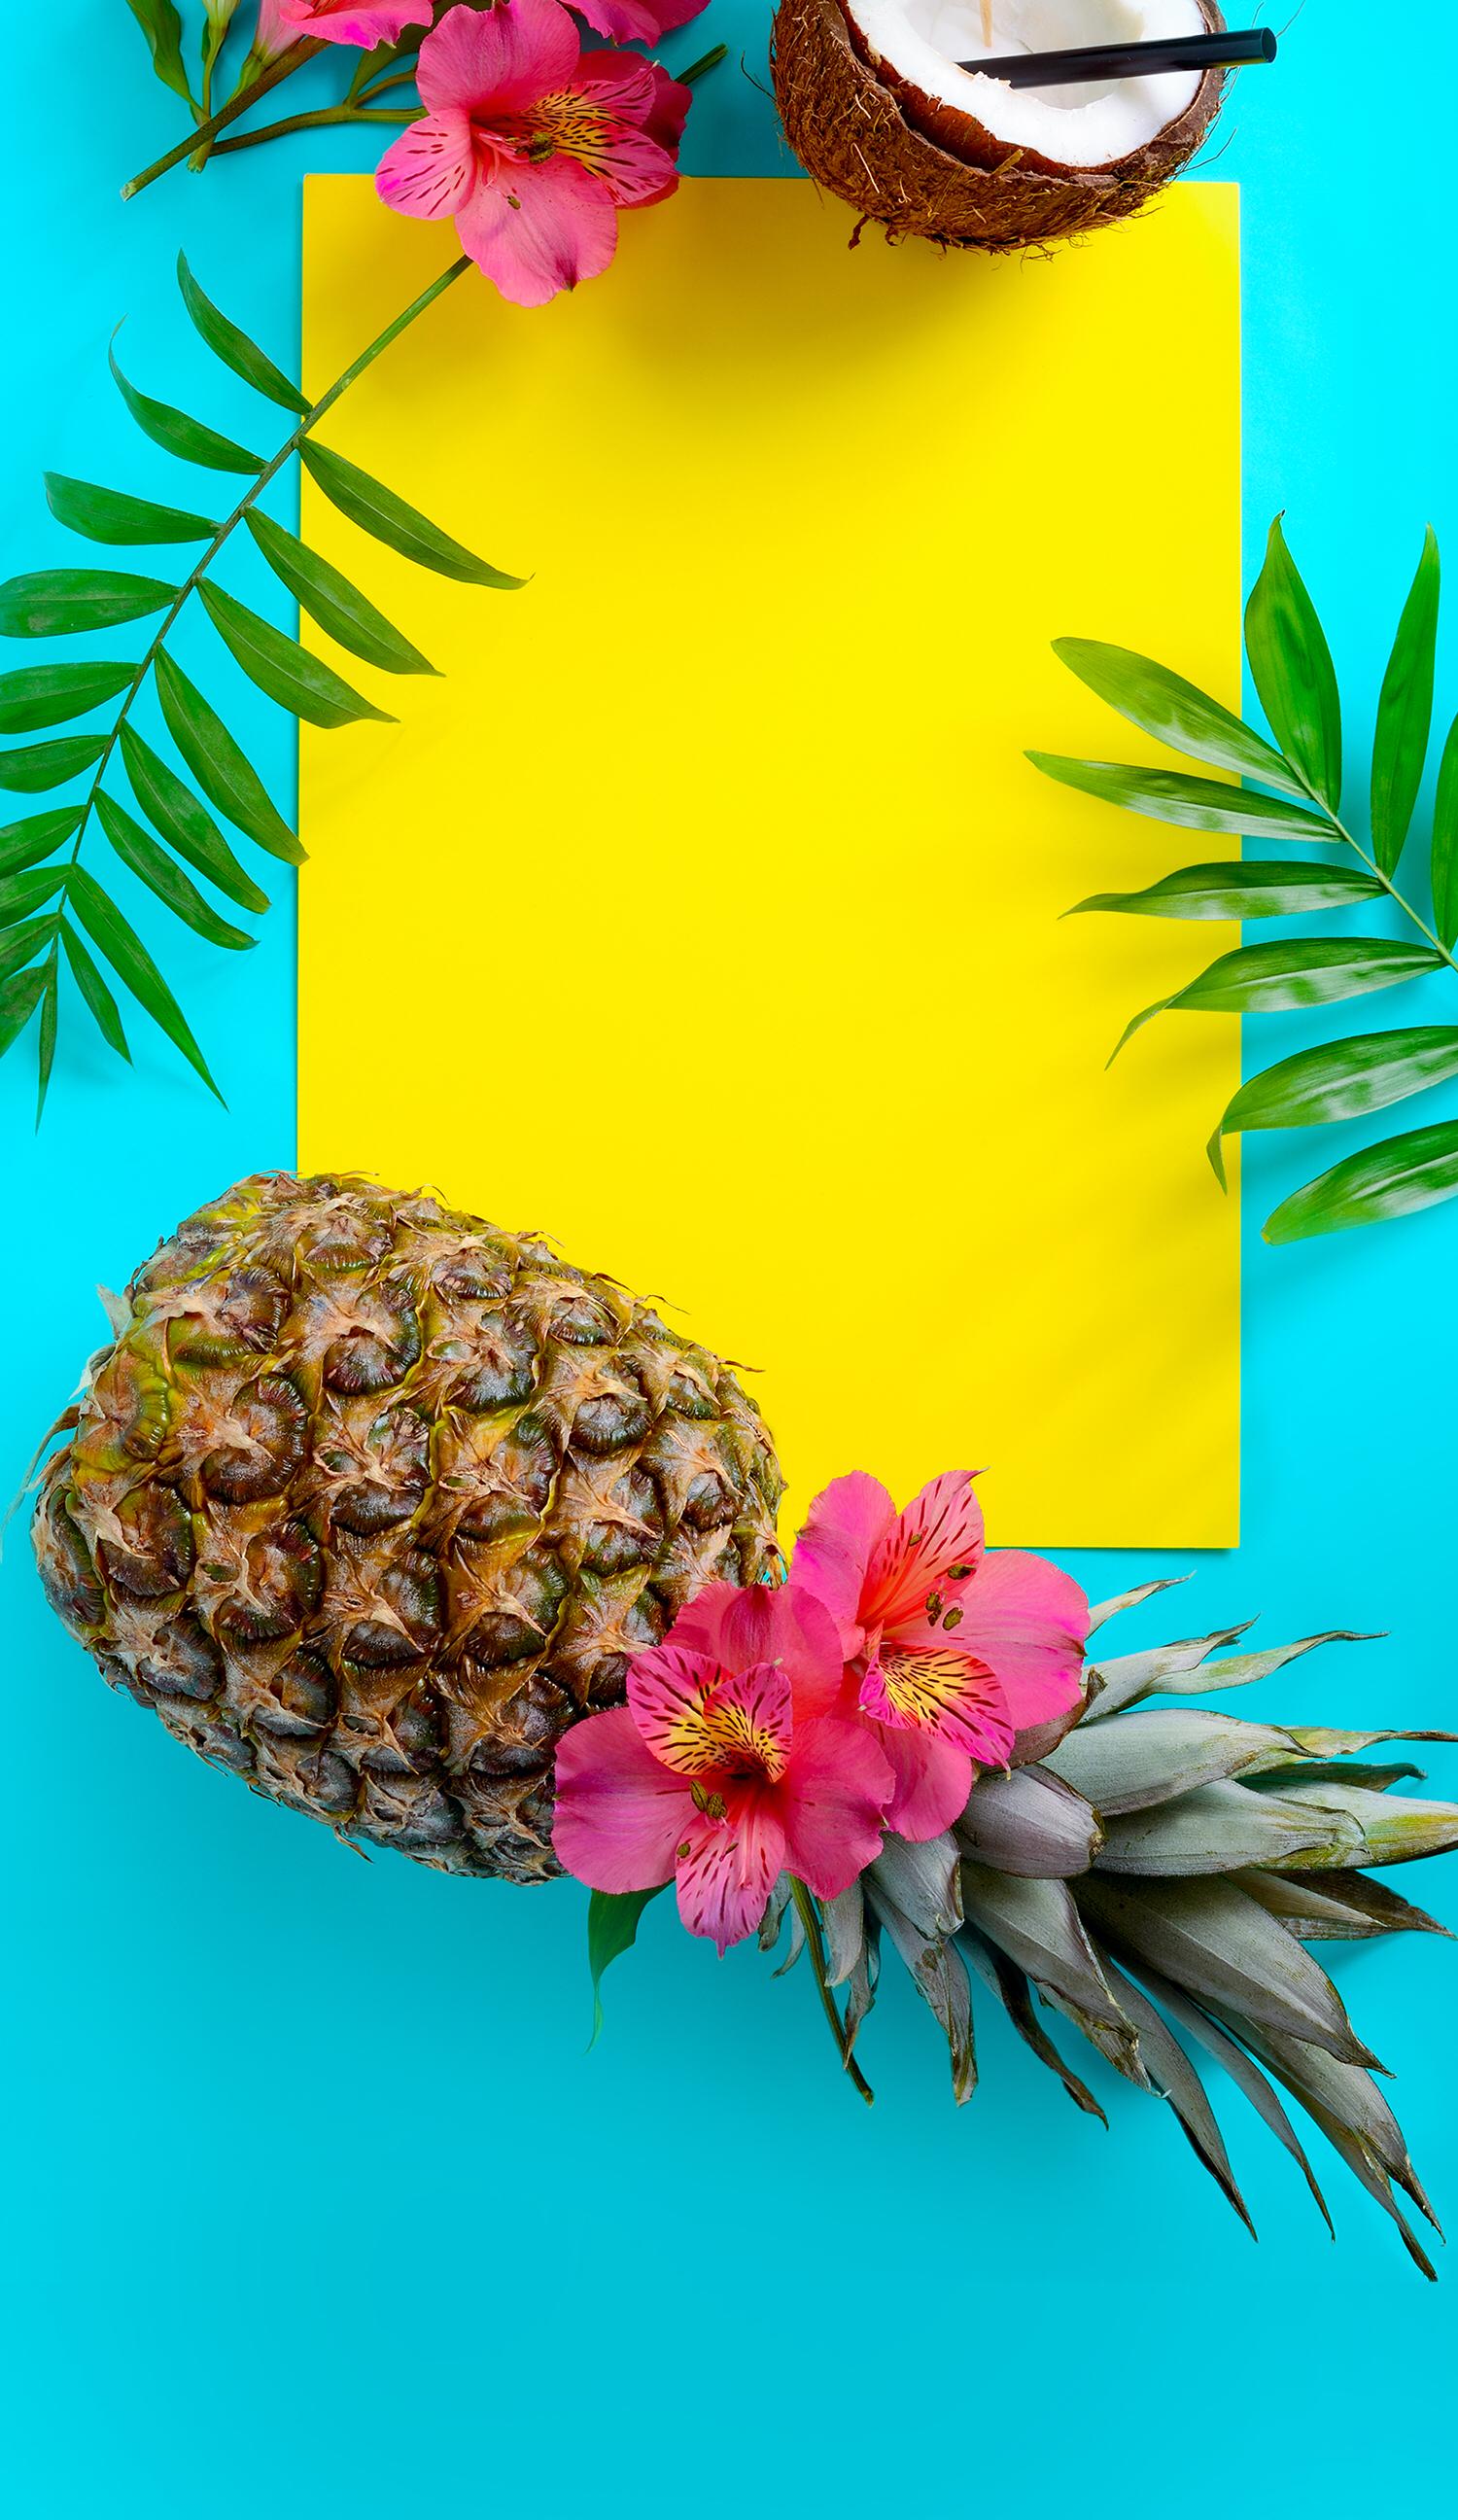 Wallpaper iphone tropical - Summer Wallpaper Iphone Wallpaper Tropical Fruit Wallpapers Kawaii Beautiful Backgrounds Signboards